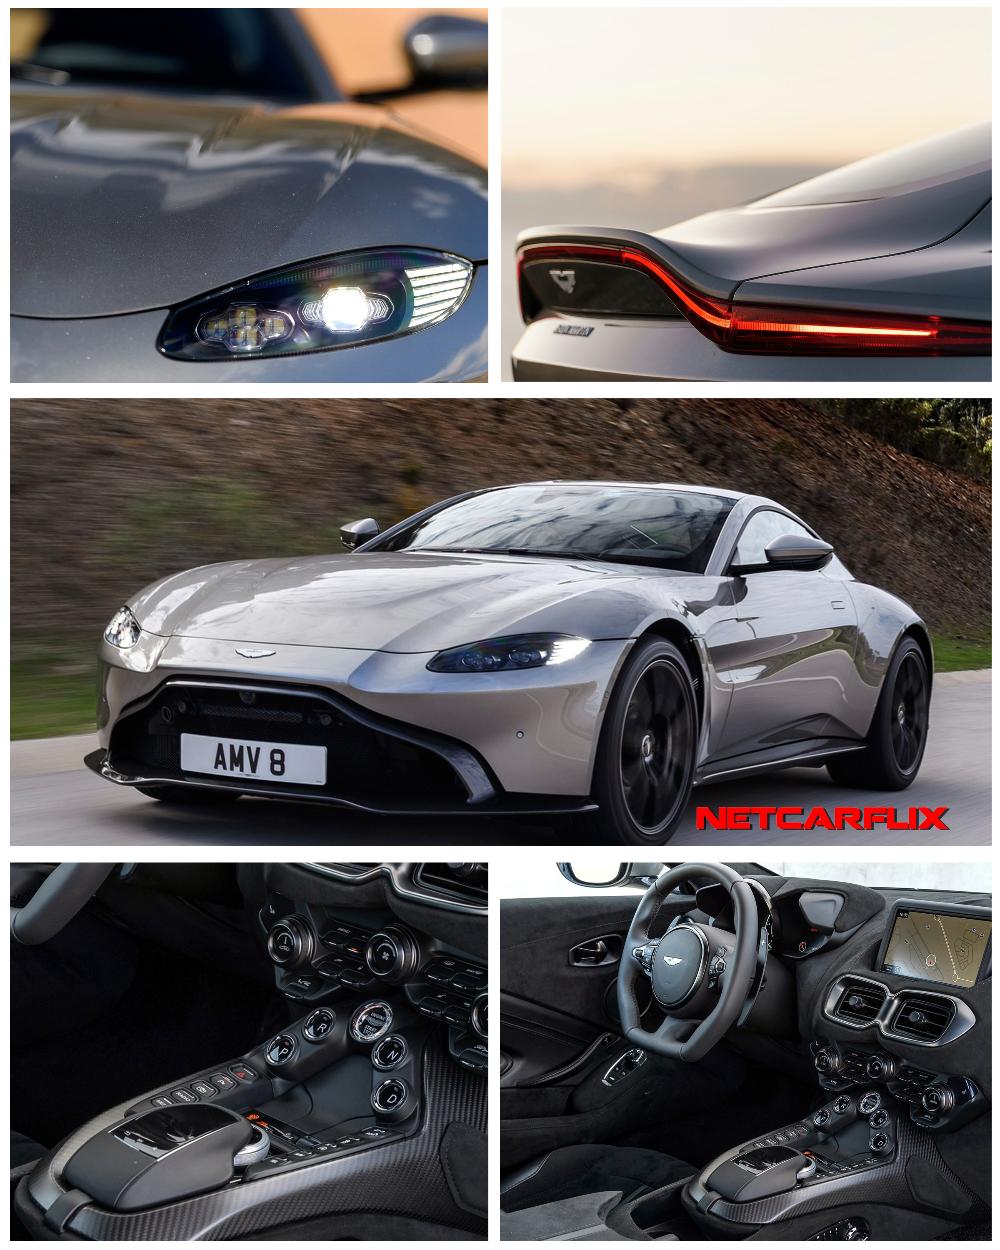 2019 Aston Martin Vantage Tungsten Silver -HQ Pictures